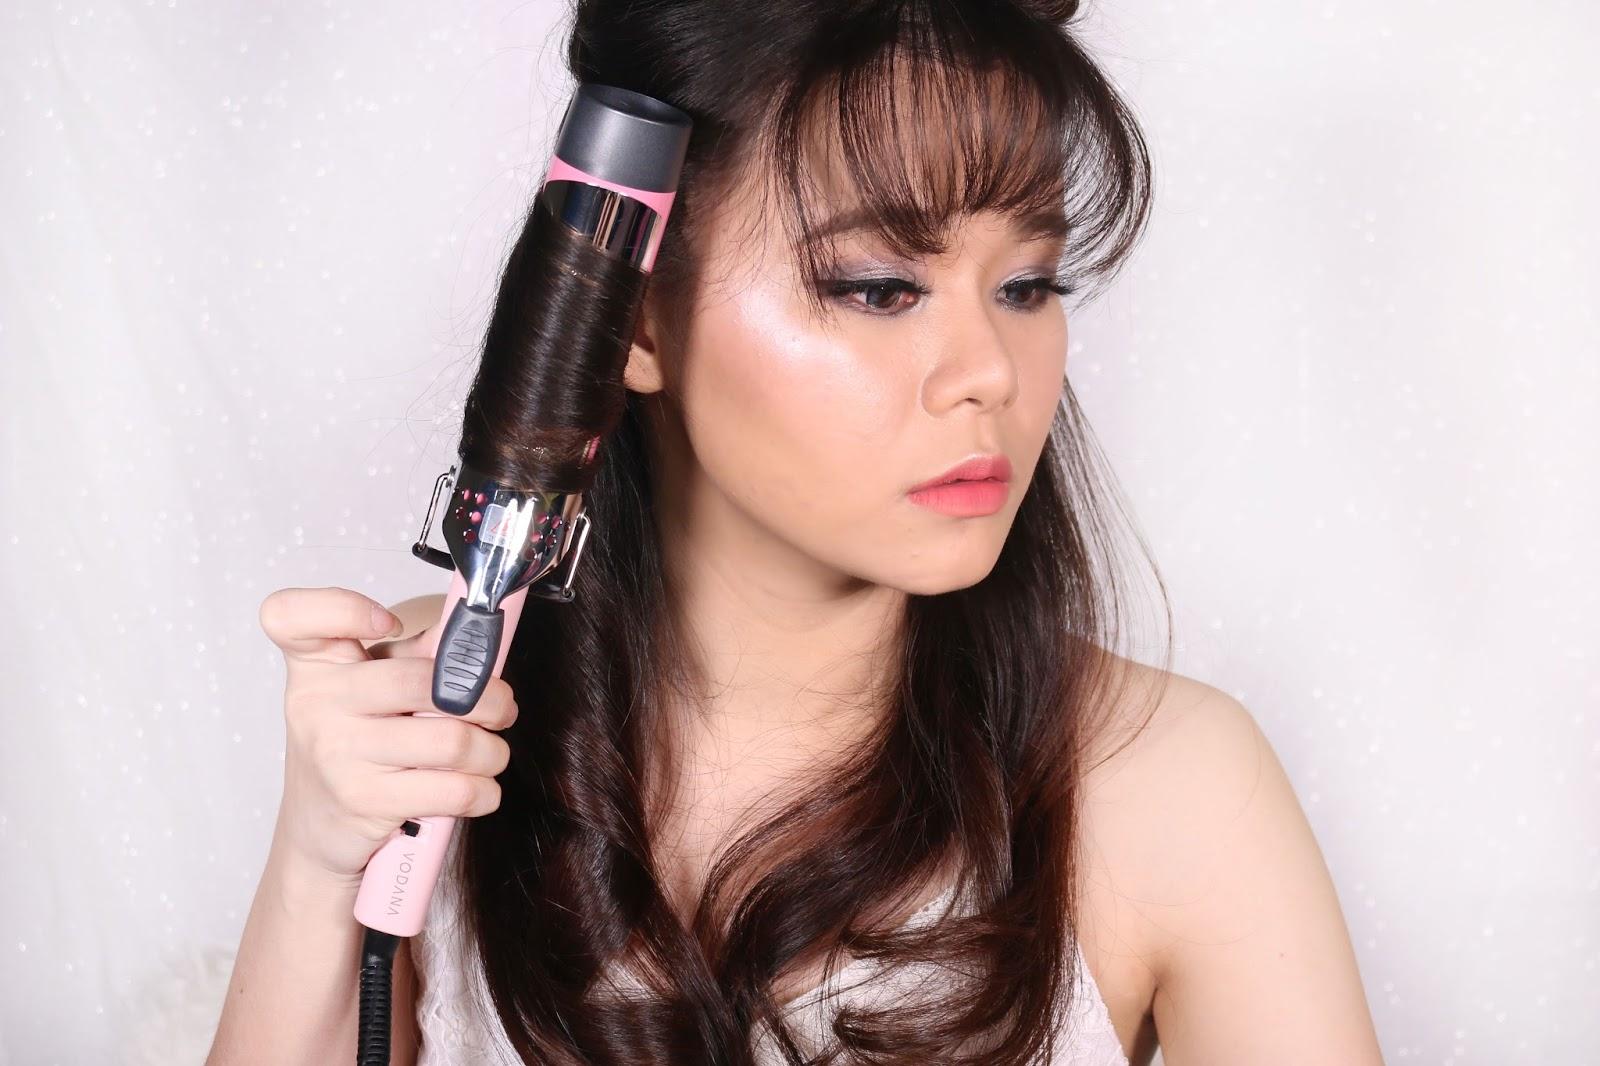 hair, hair style, how to style hair, hair wave, hair styling, tutorial, tutorial menata rambut, vodana, vodana hair diva, vodana glamwave, vodana hair tool